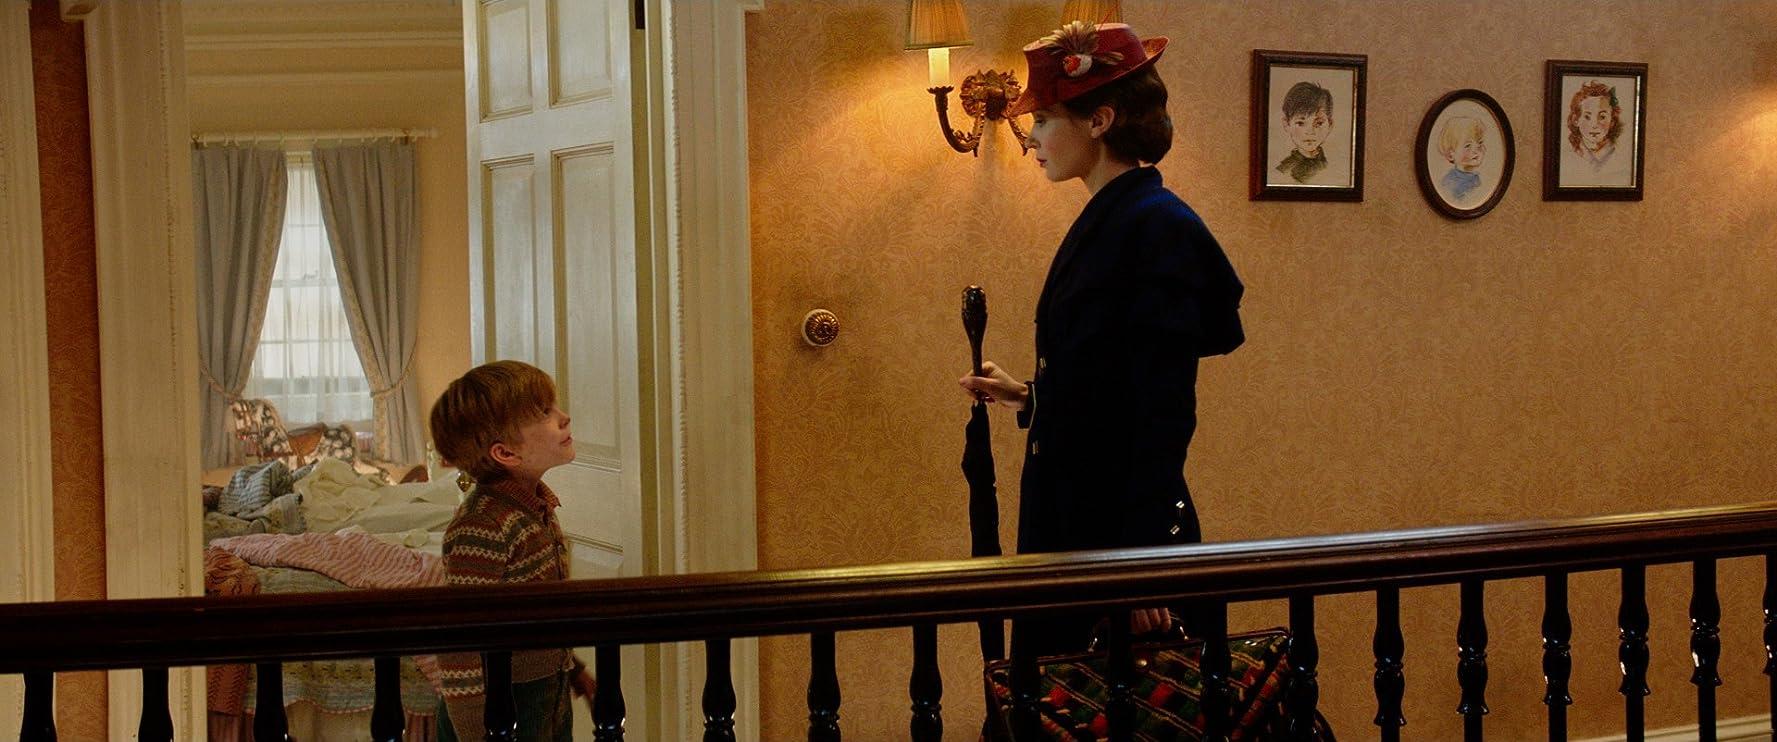 Mary Poppins Returns / IMDB.com